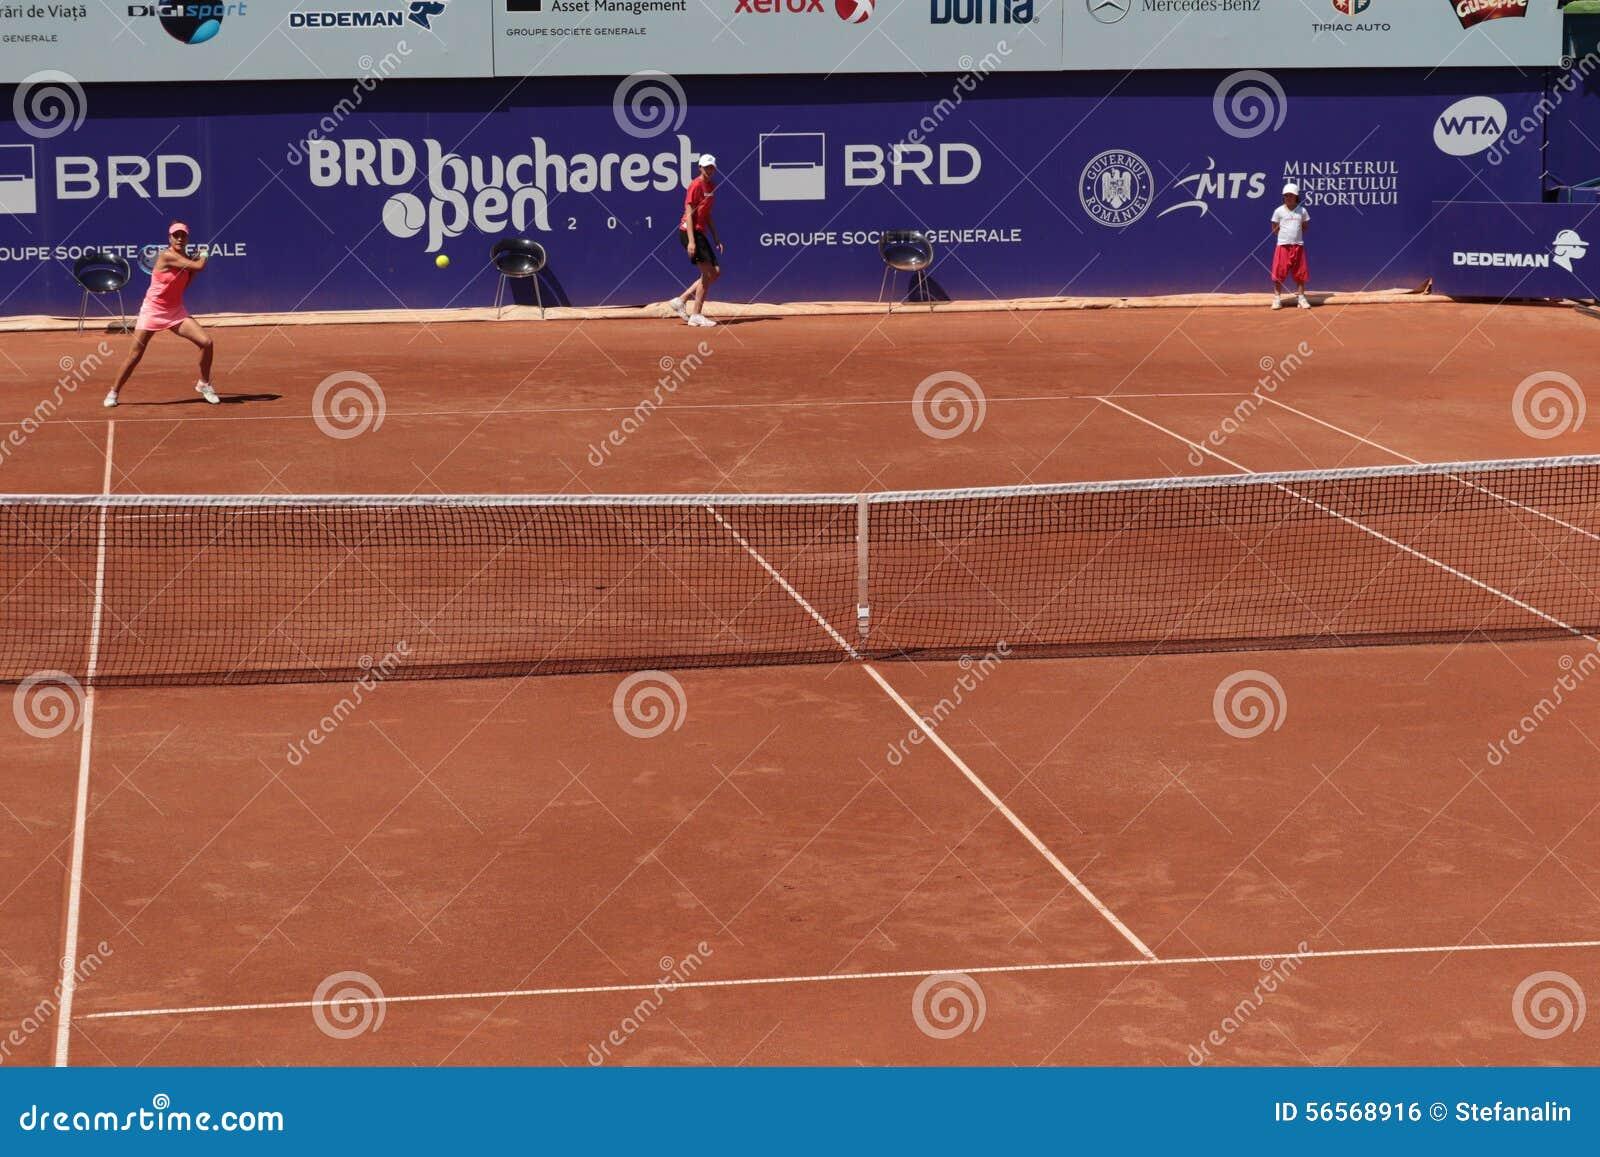 Download Η ΟΔΓ Βουκουρέστι ανοίγει το 2015 Εκδοτική Εικόνες - εικόνα από ιόν, buckaroos: 56568916